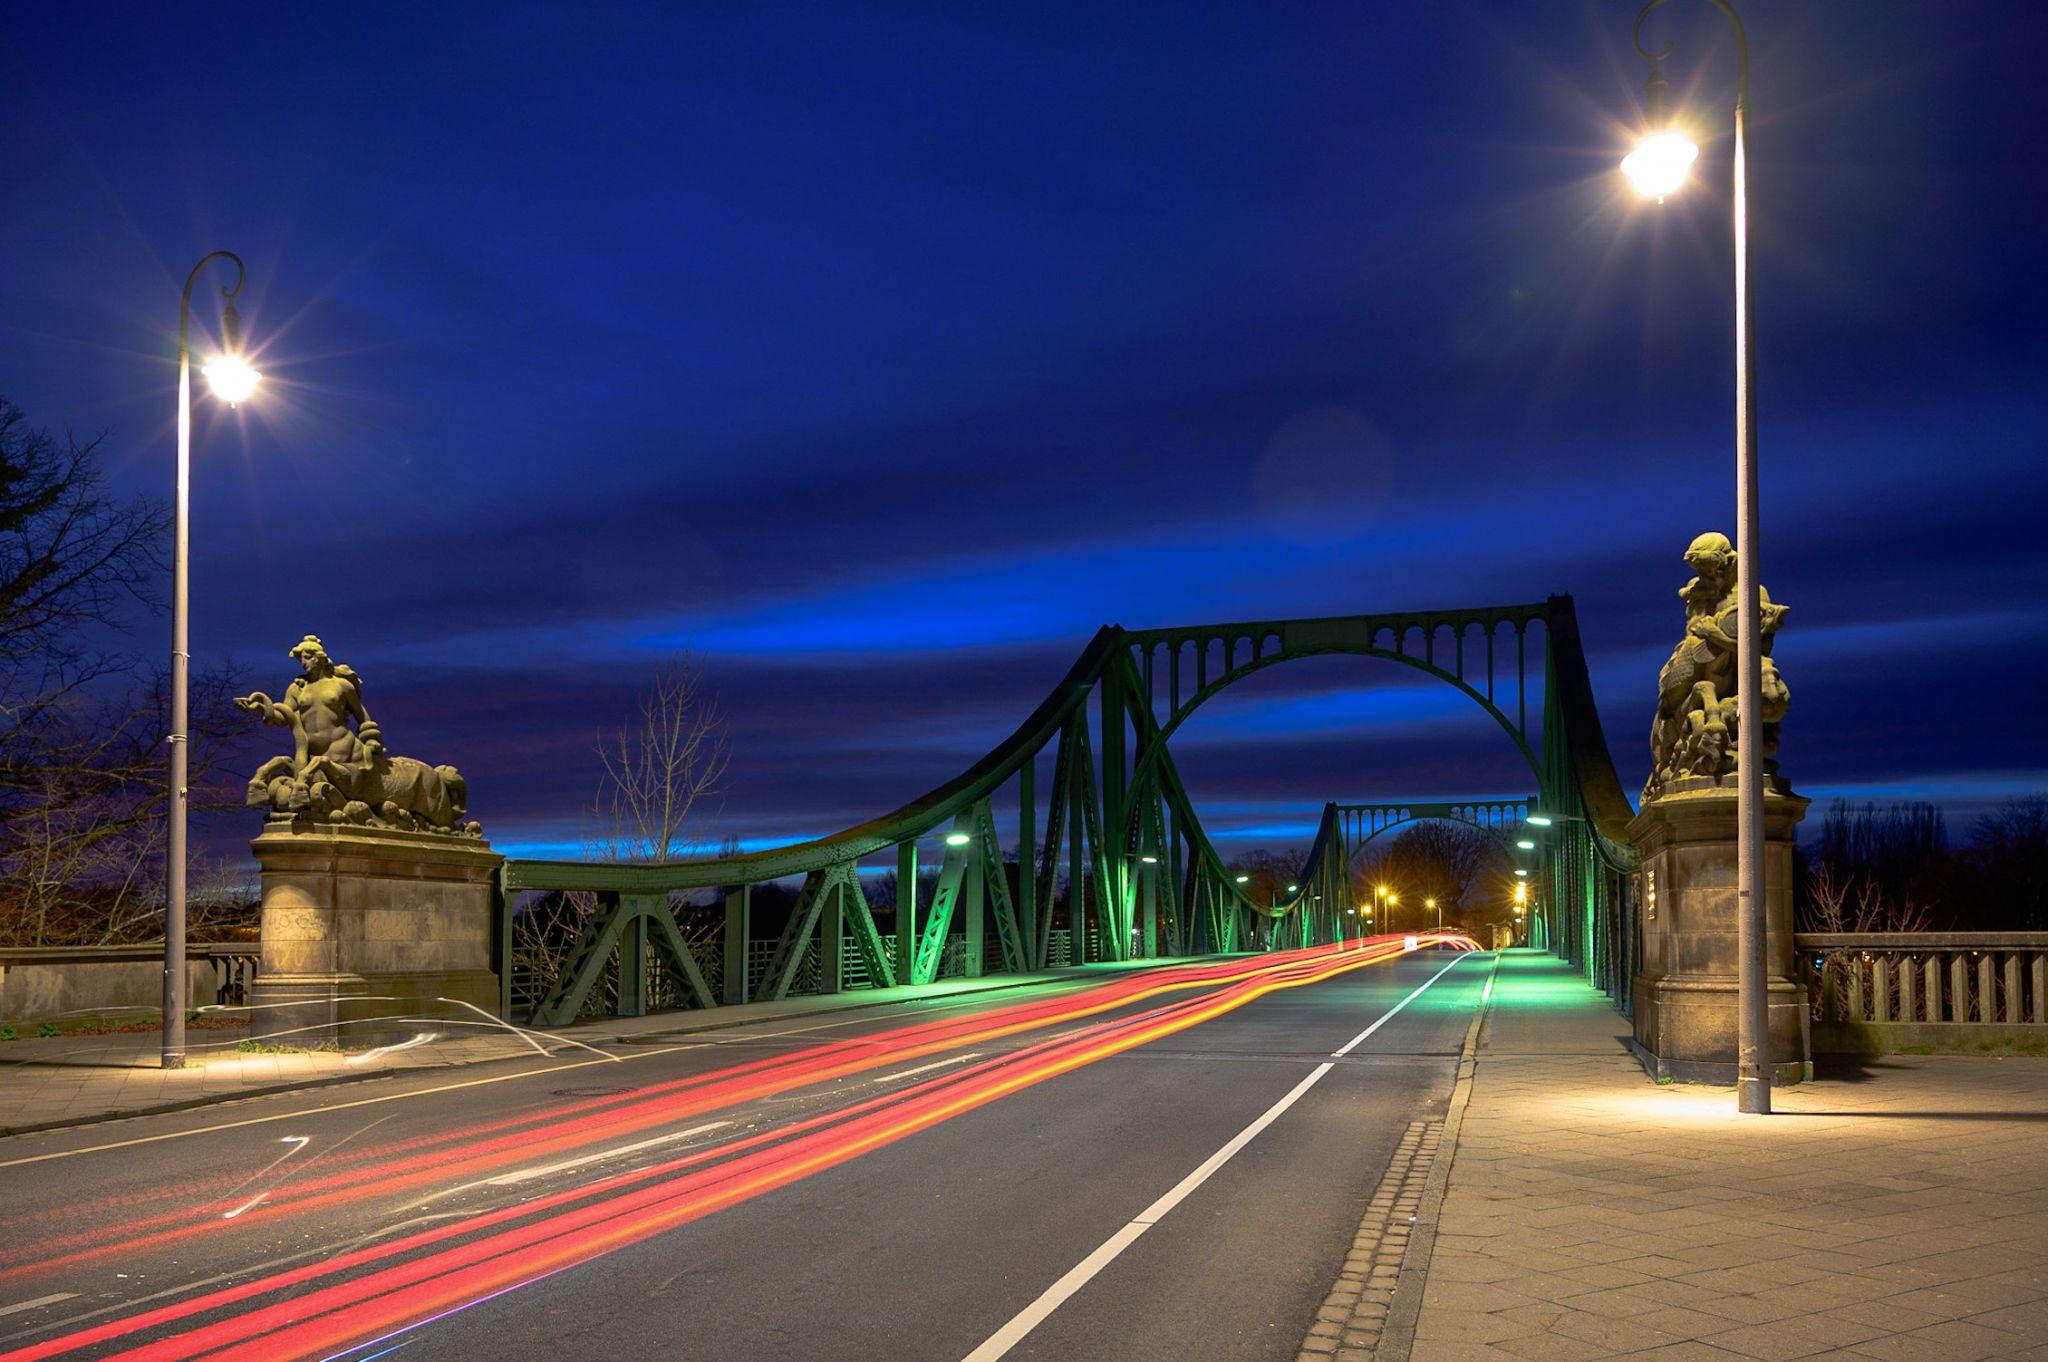 Glienicker Brücke, Germany